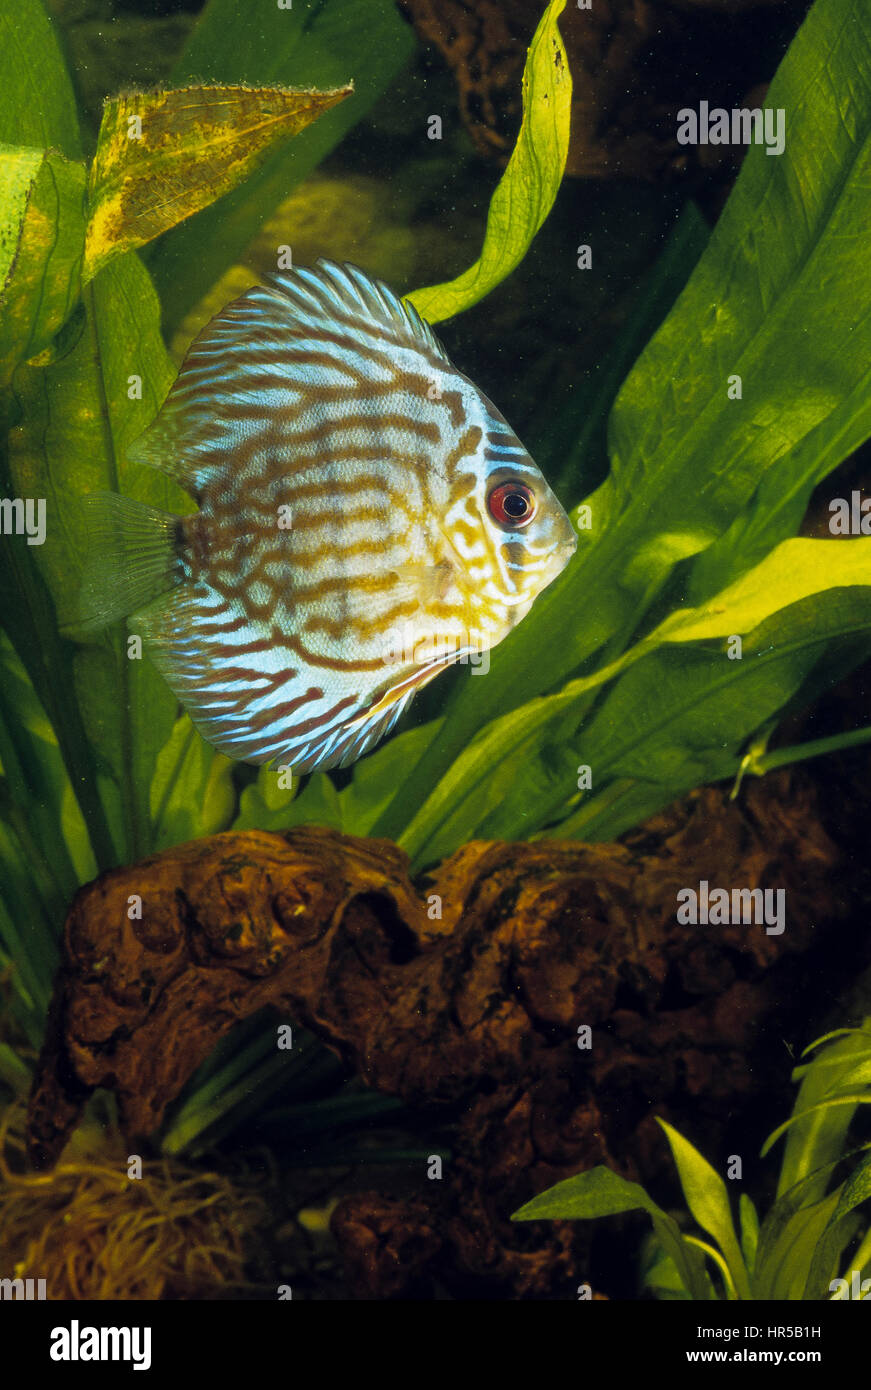 Diskusfisch, Diskus-Fisch, Diskusbuntbarsch, Diskus-Buntbarsch, Diskus, Symphysodon aequifasciatus, Symphysodon Stock Photo